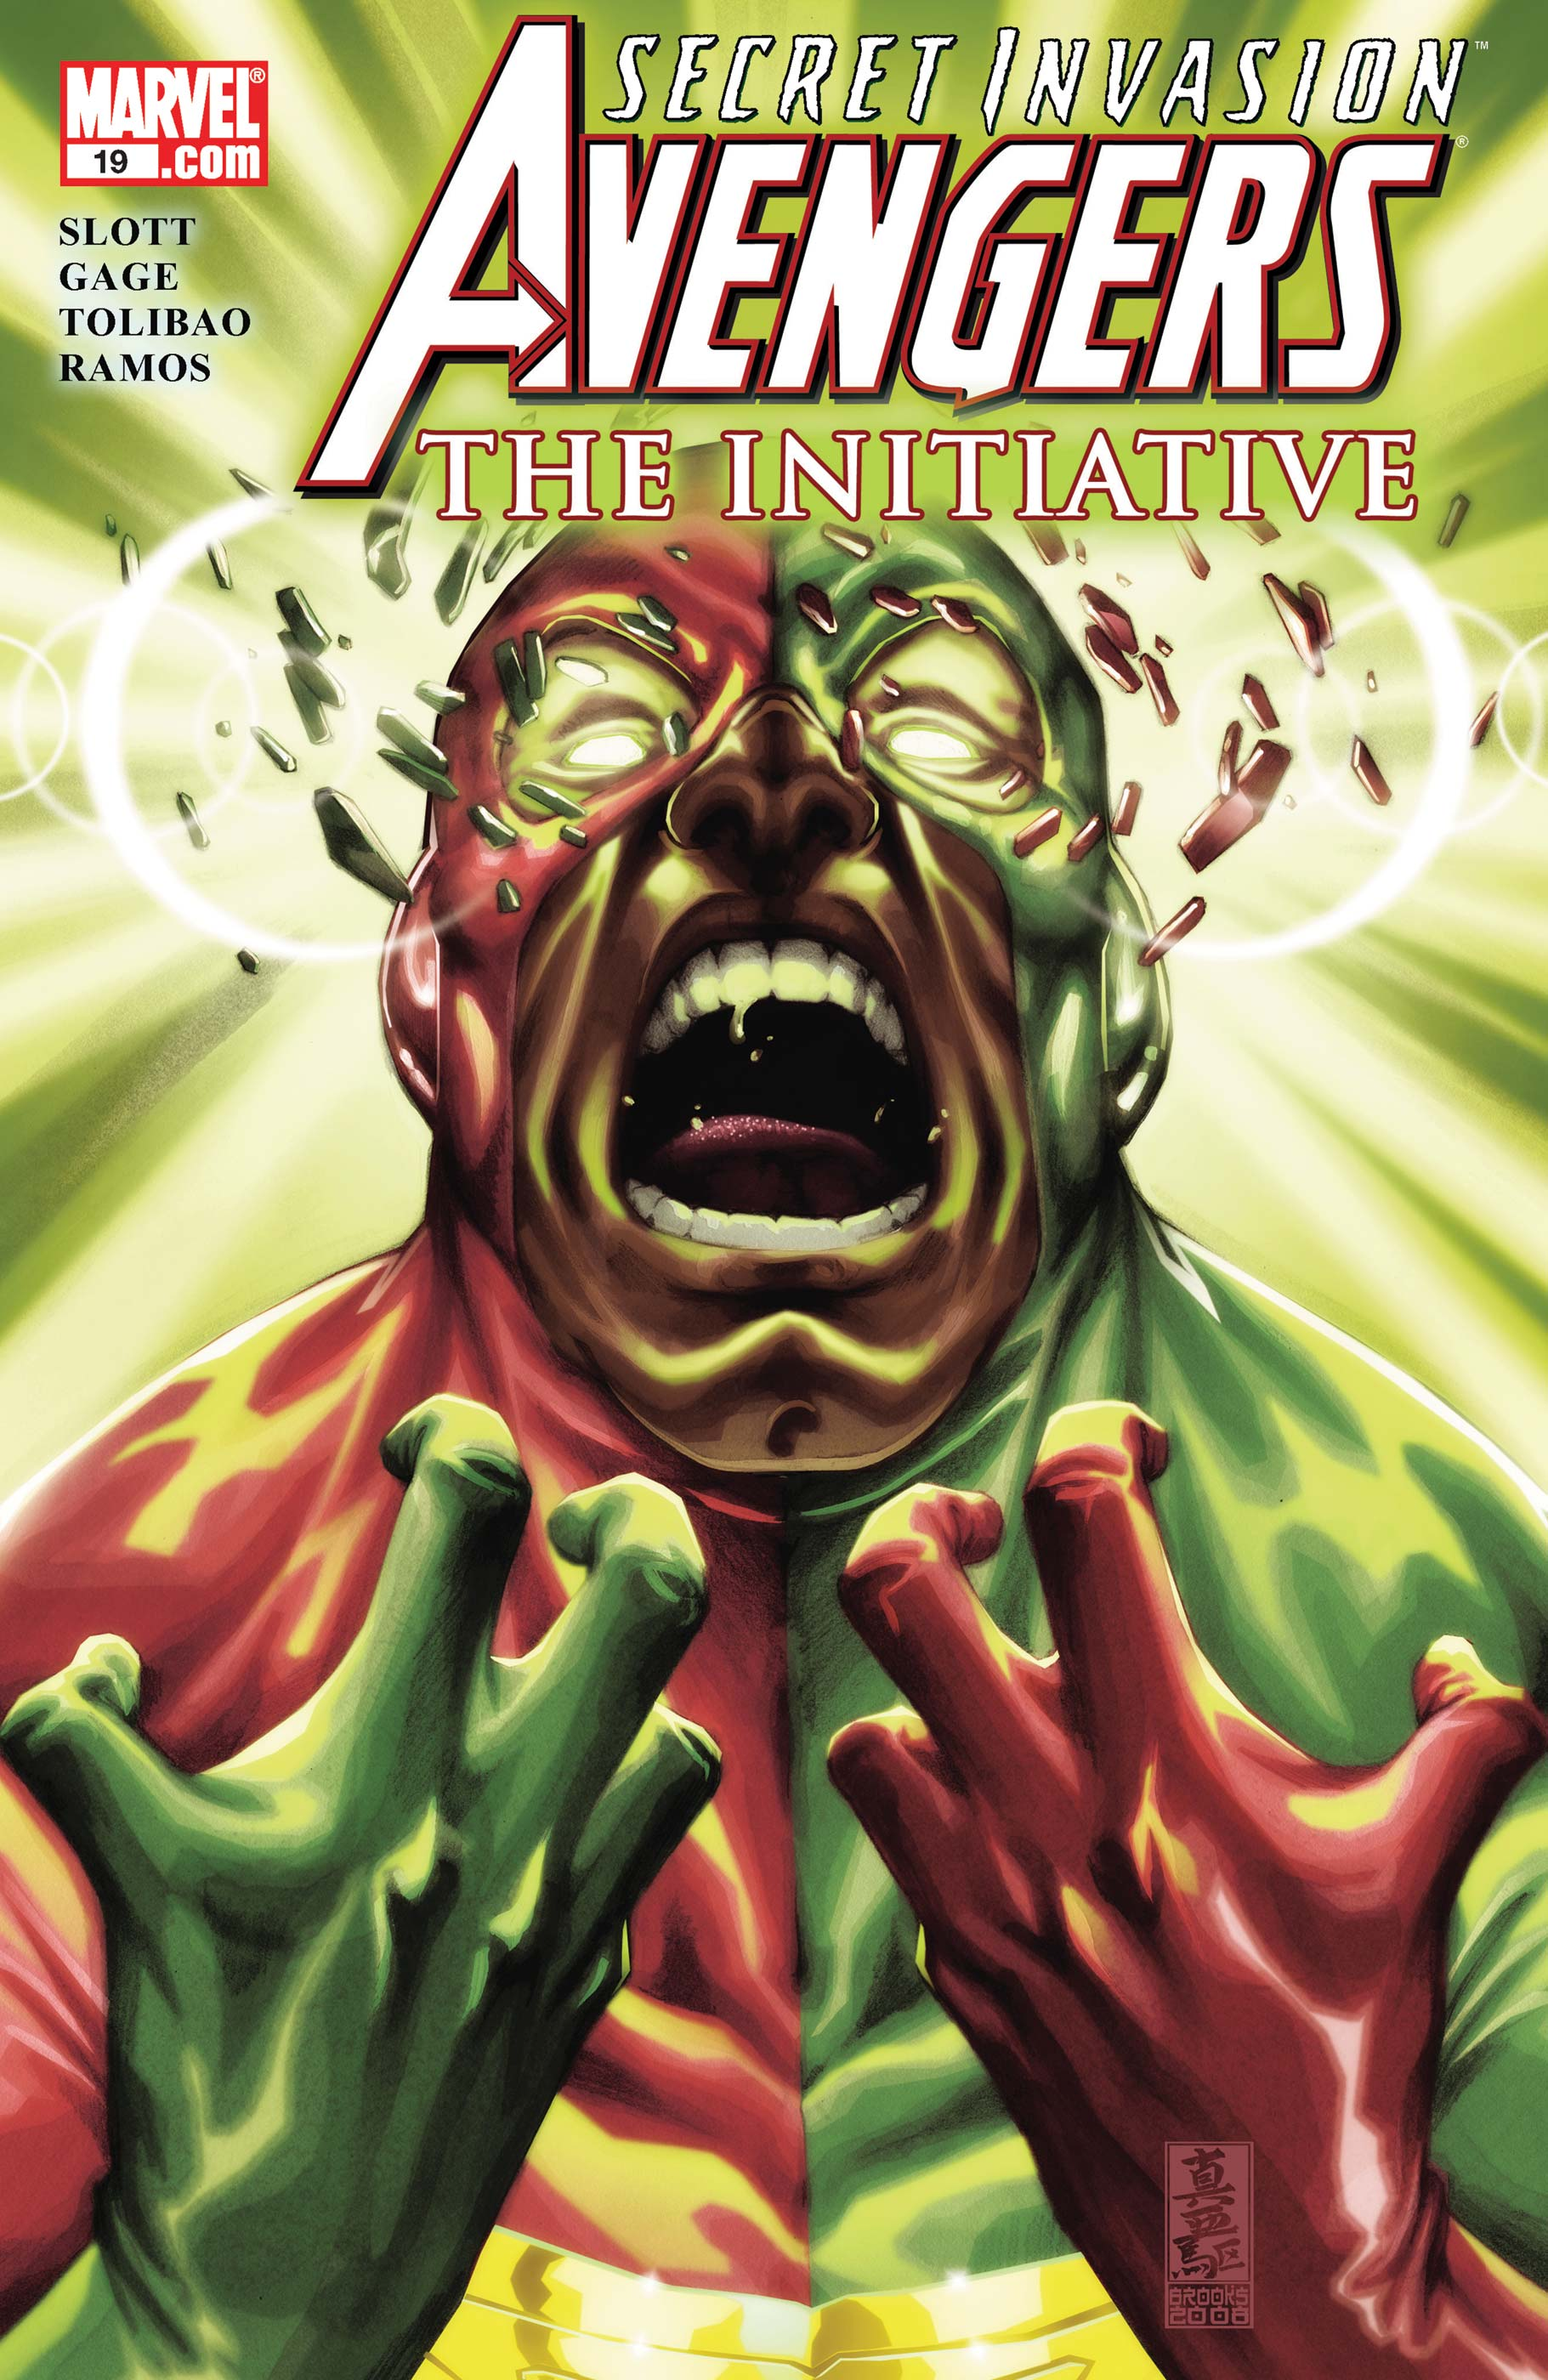 Avengers: The Initiative (2007) #19